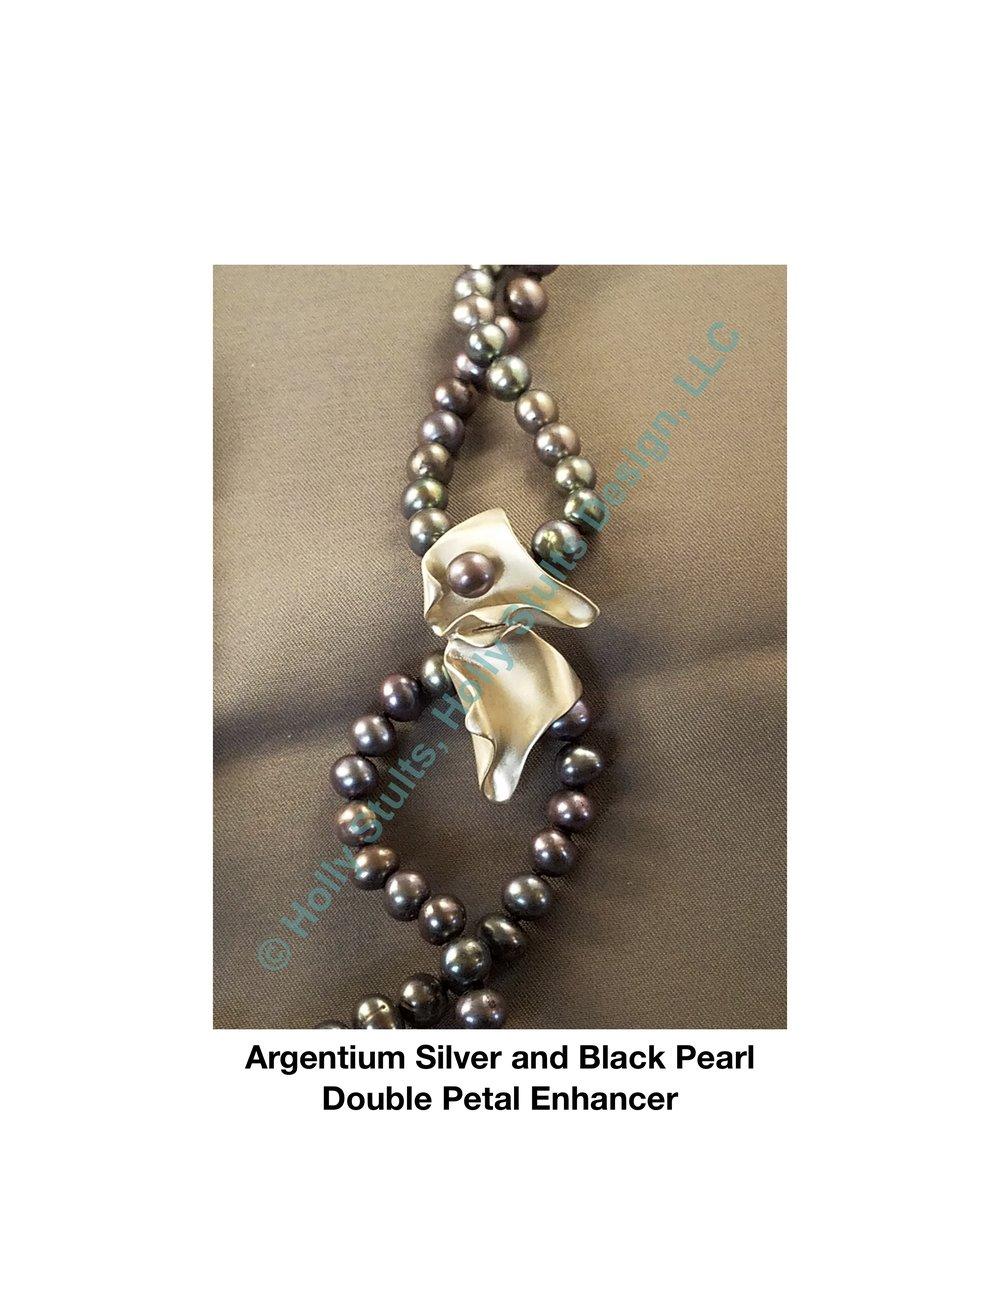 Argentium Silver and Black Pearl Double Petal Enhancer.jpg